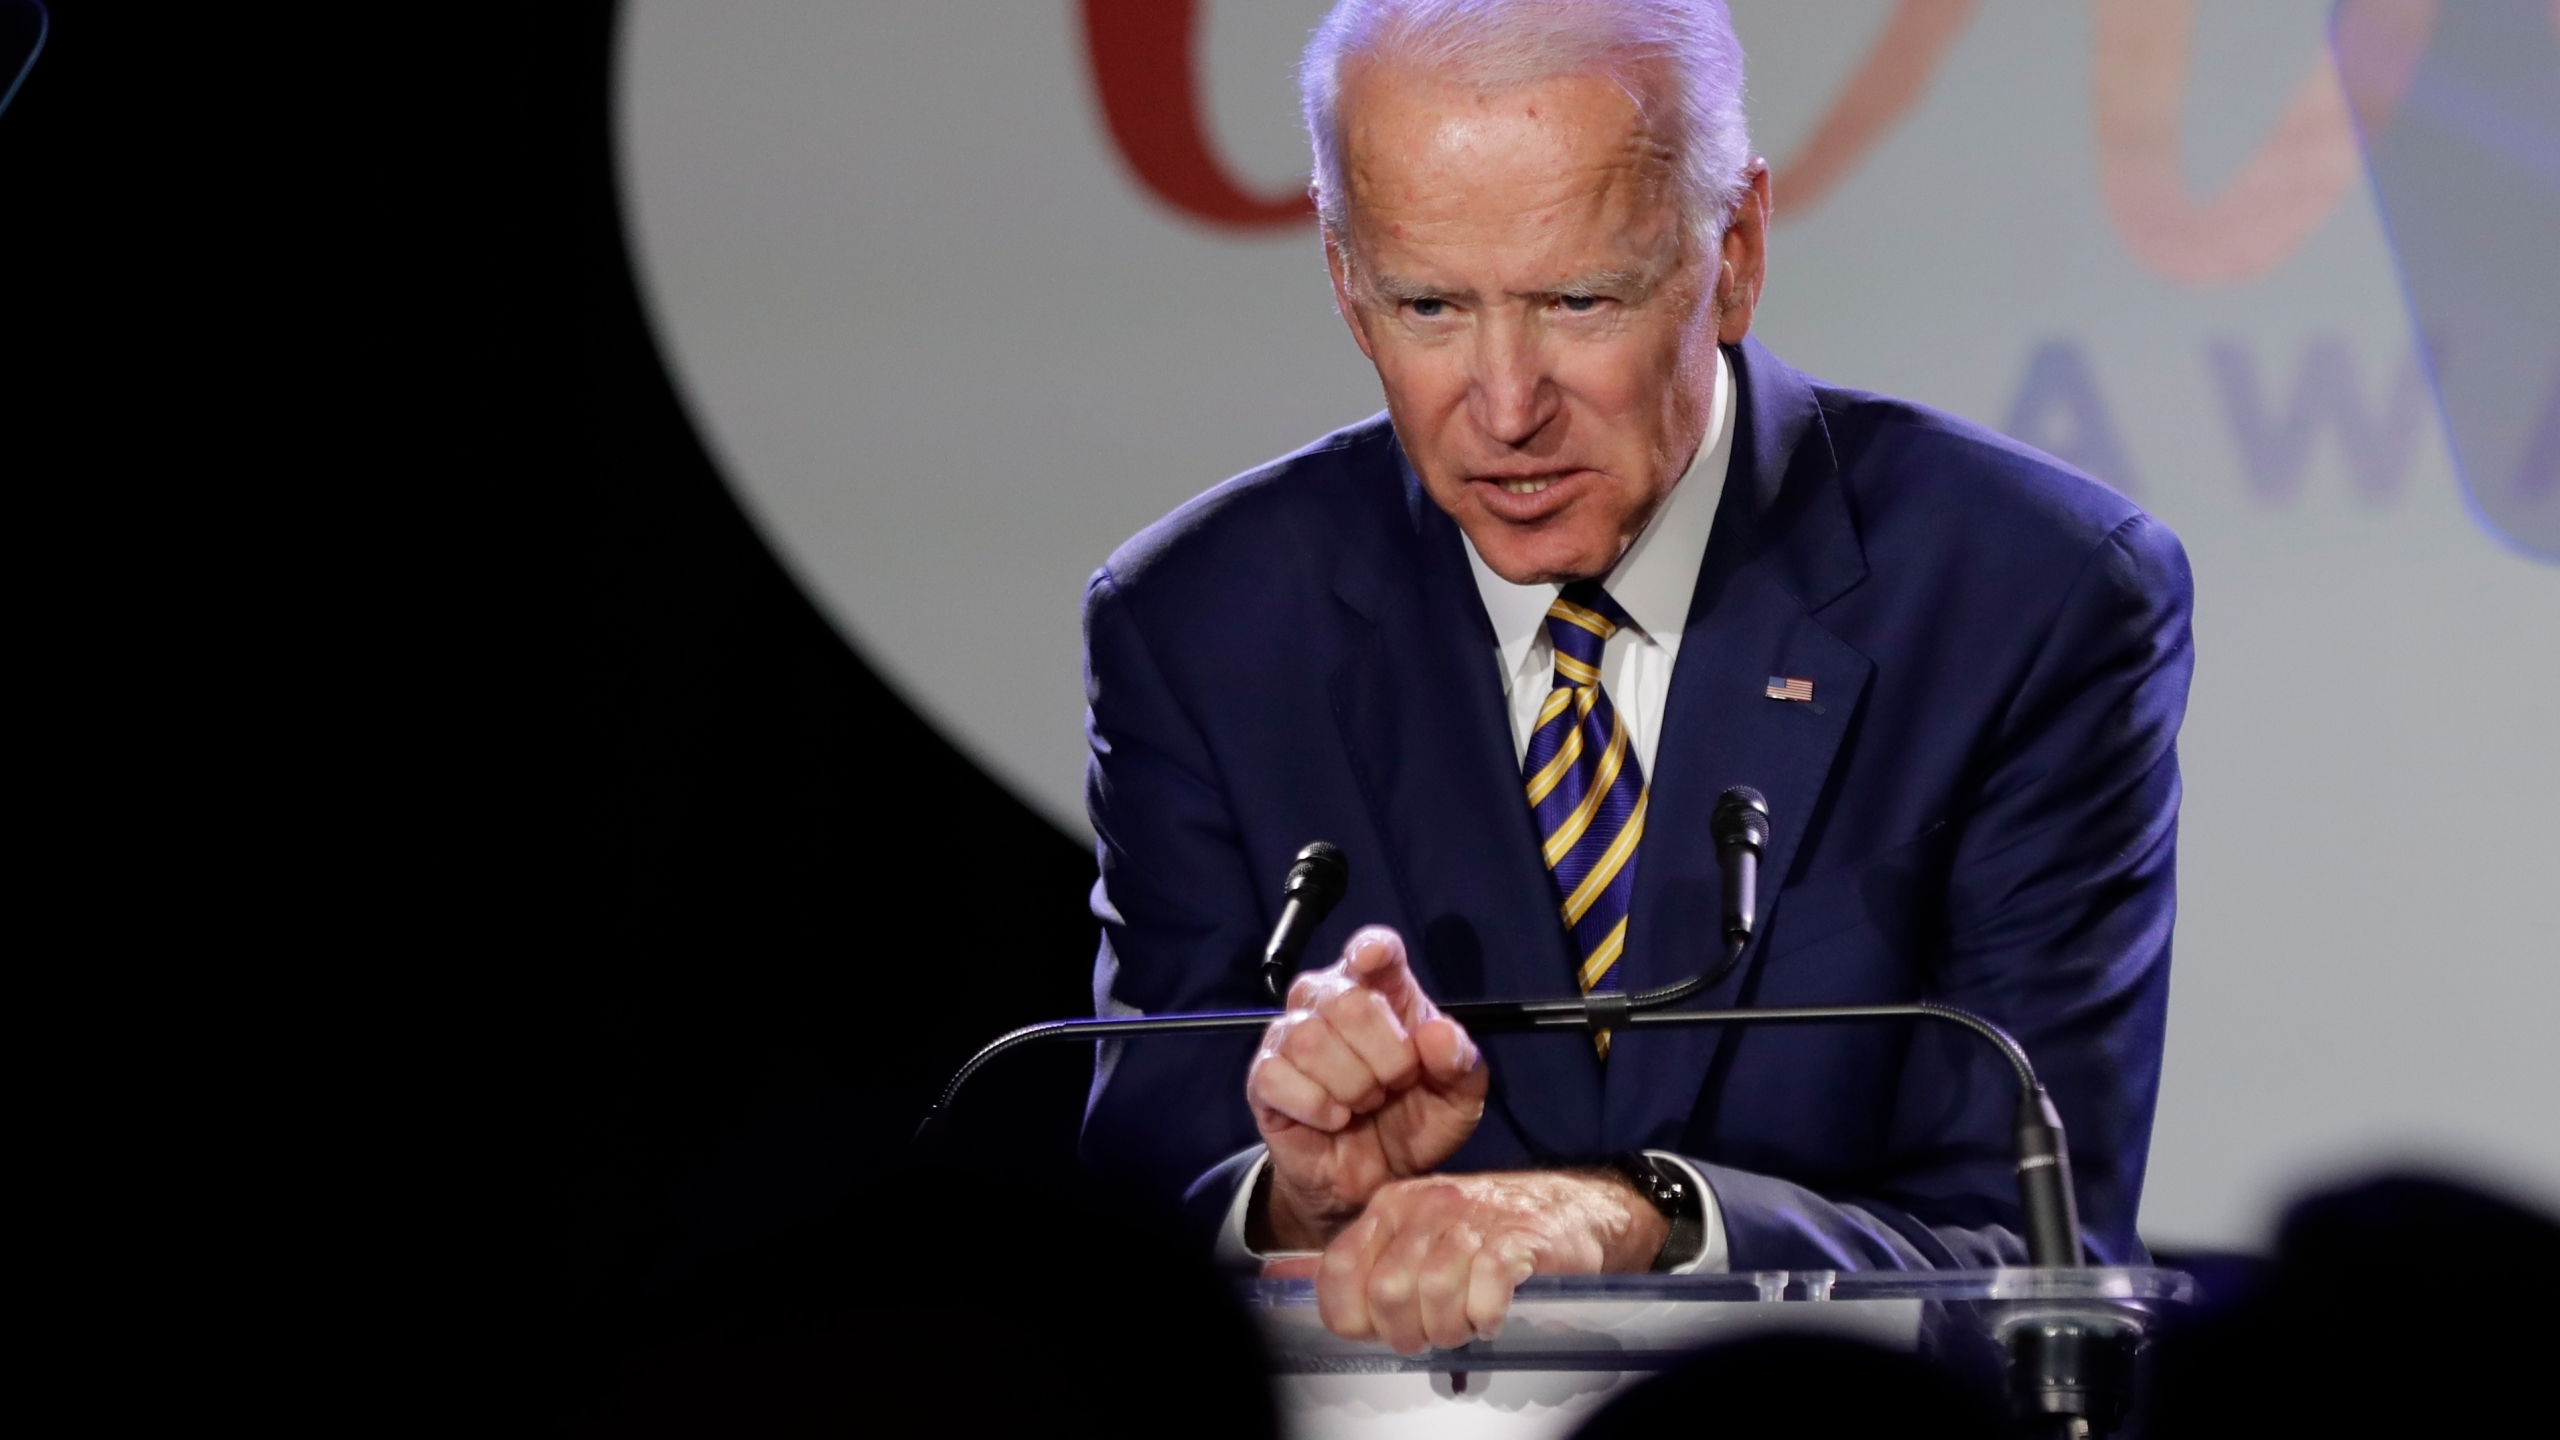 Election_2020_Joe_Biden_53157-159532-159532.jpg28149933